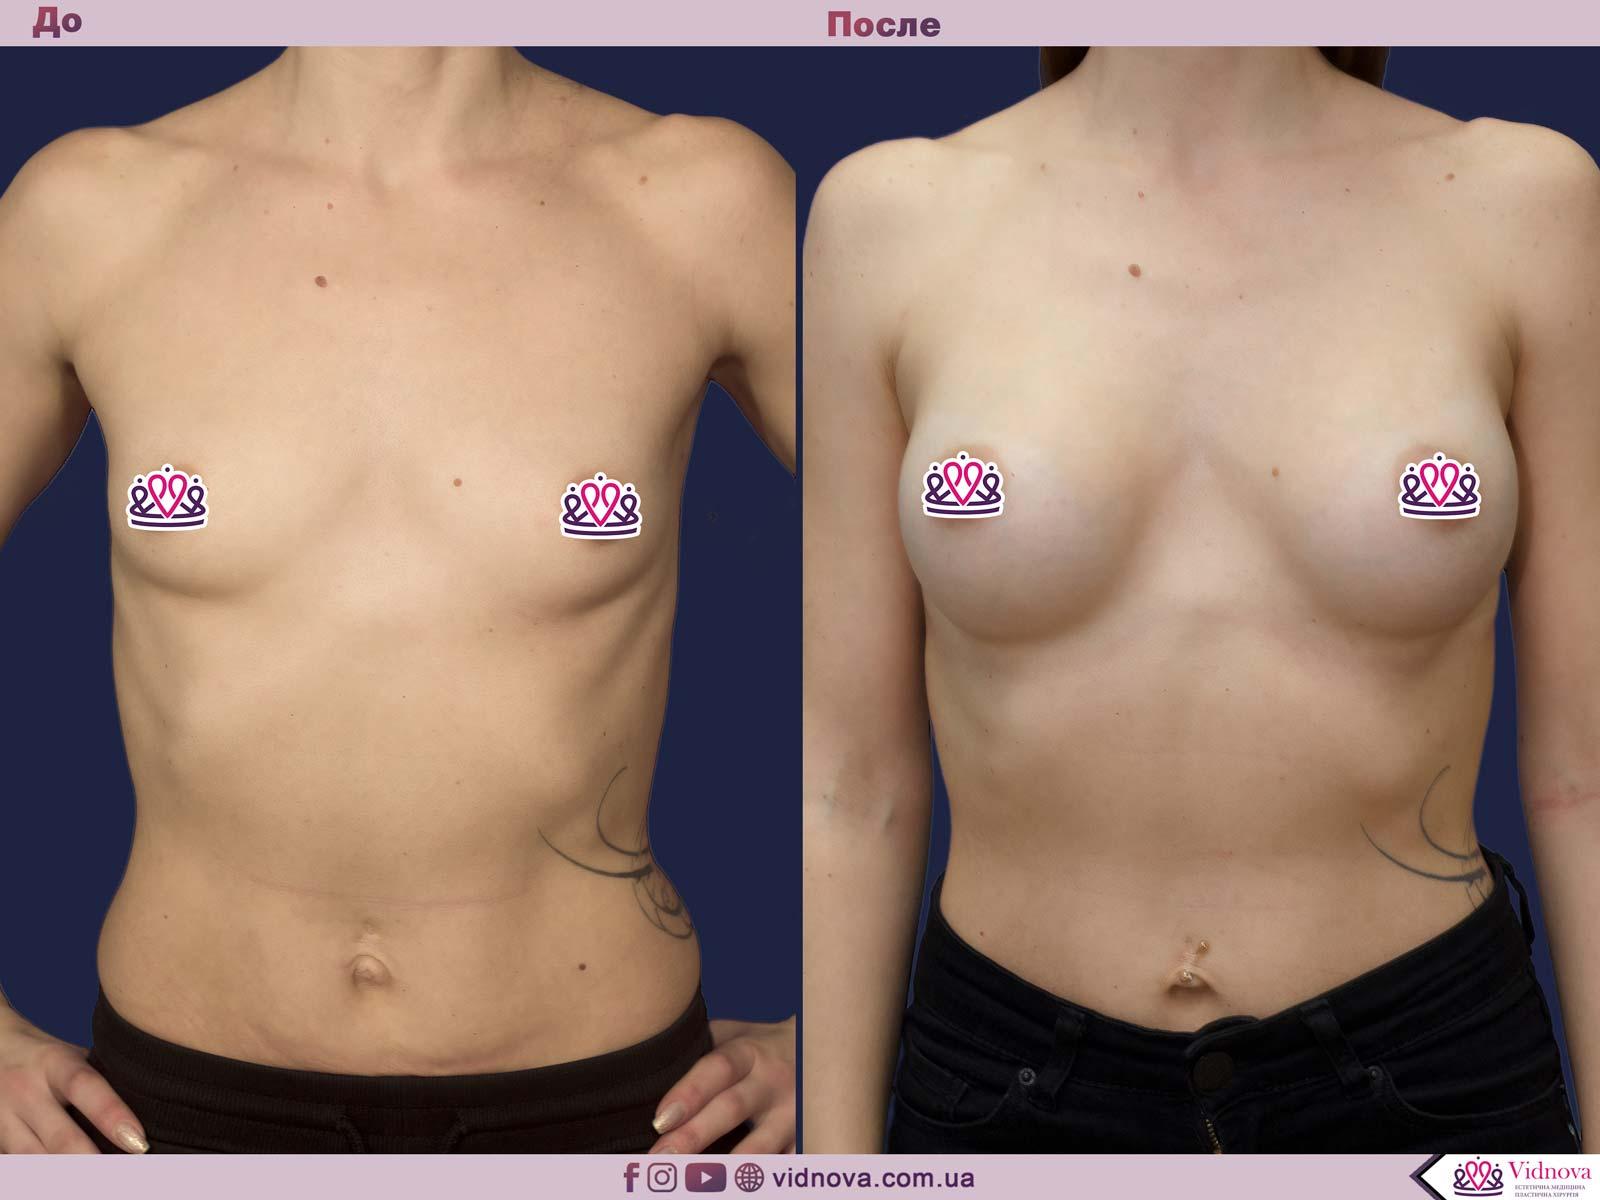 Увеличение груди: Фото ДО и ПОСЛЕ - Пример №62-1 - Клиника Vidnova